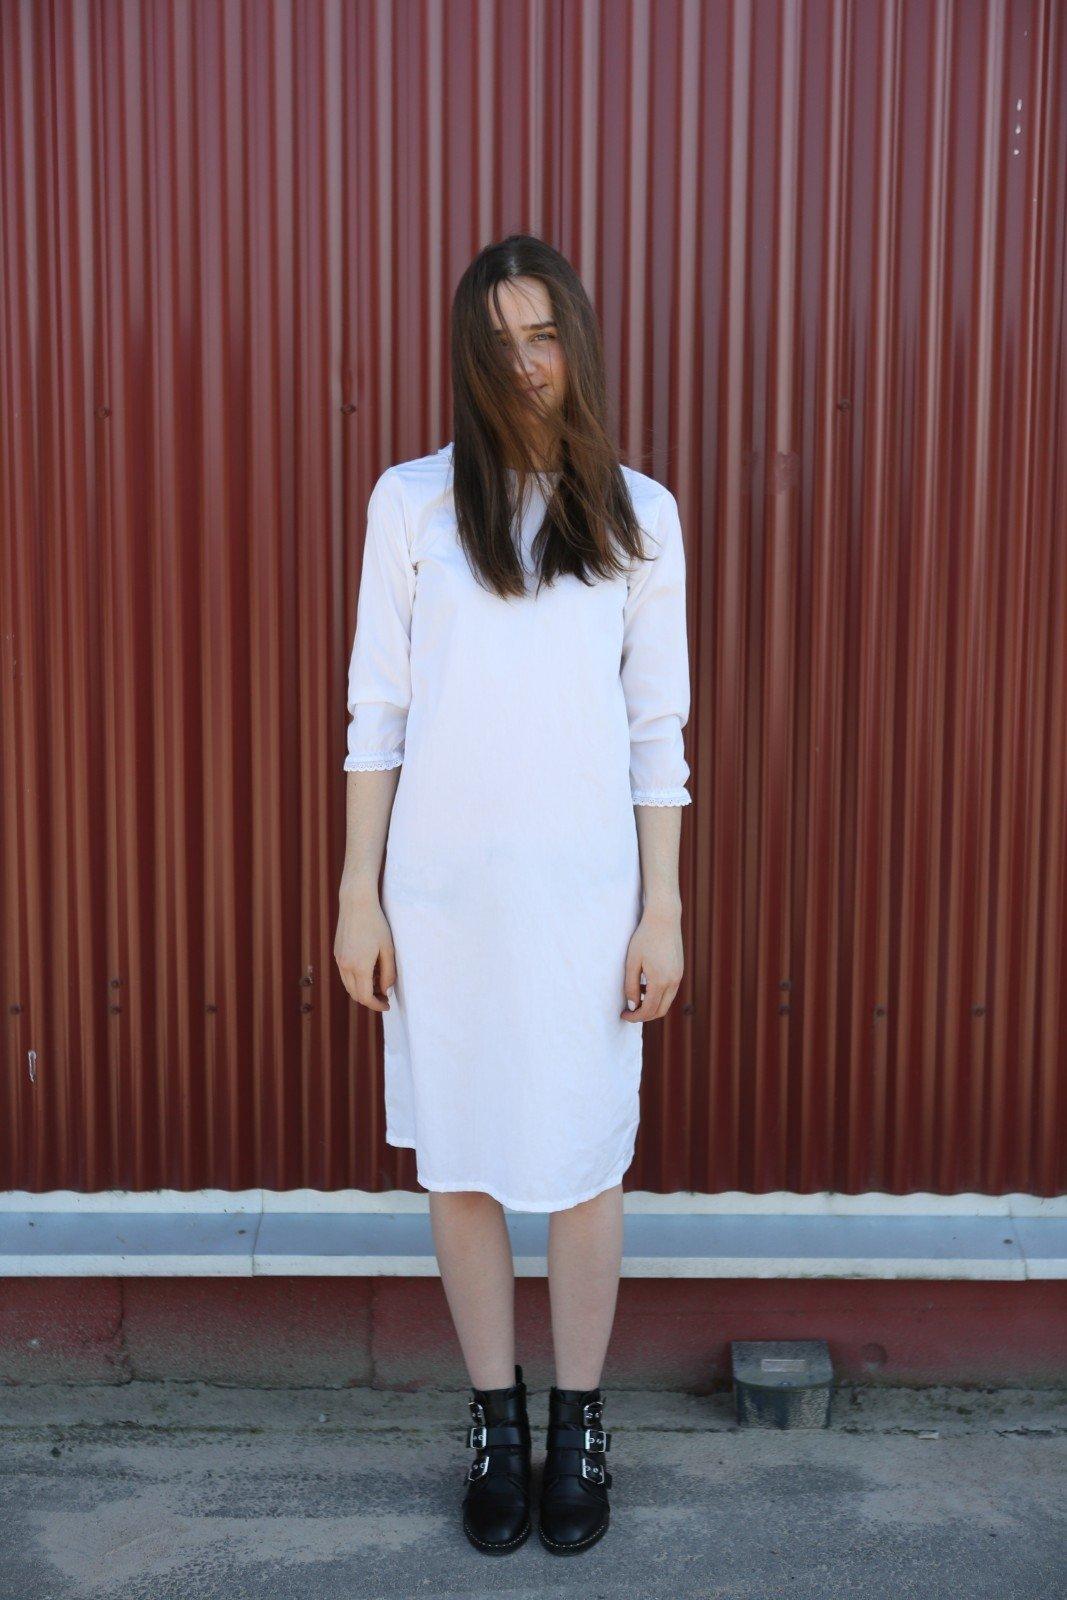 Balta suknelė – 1,20 euro